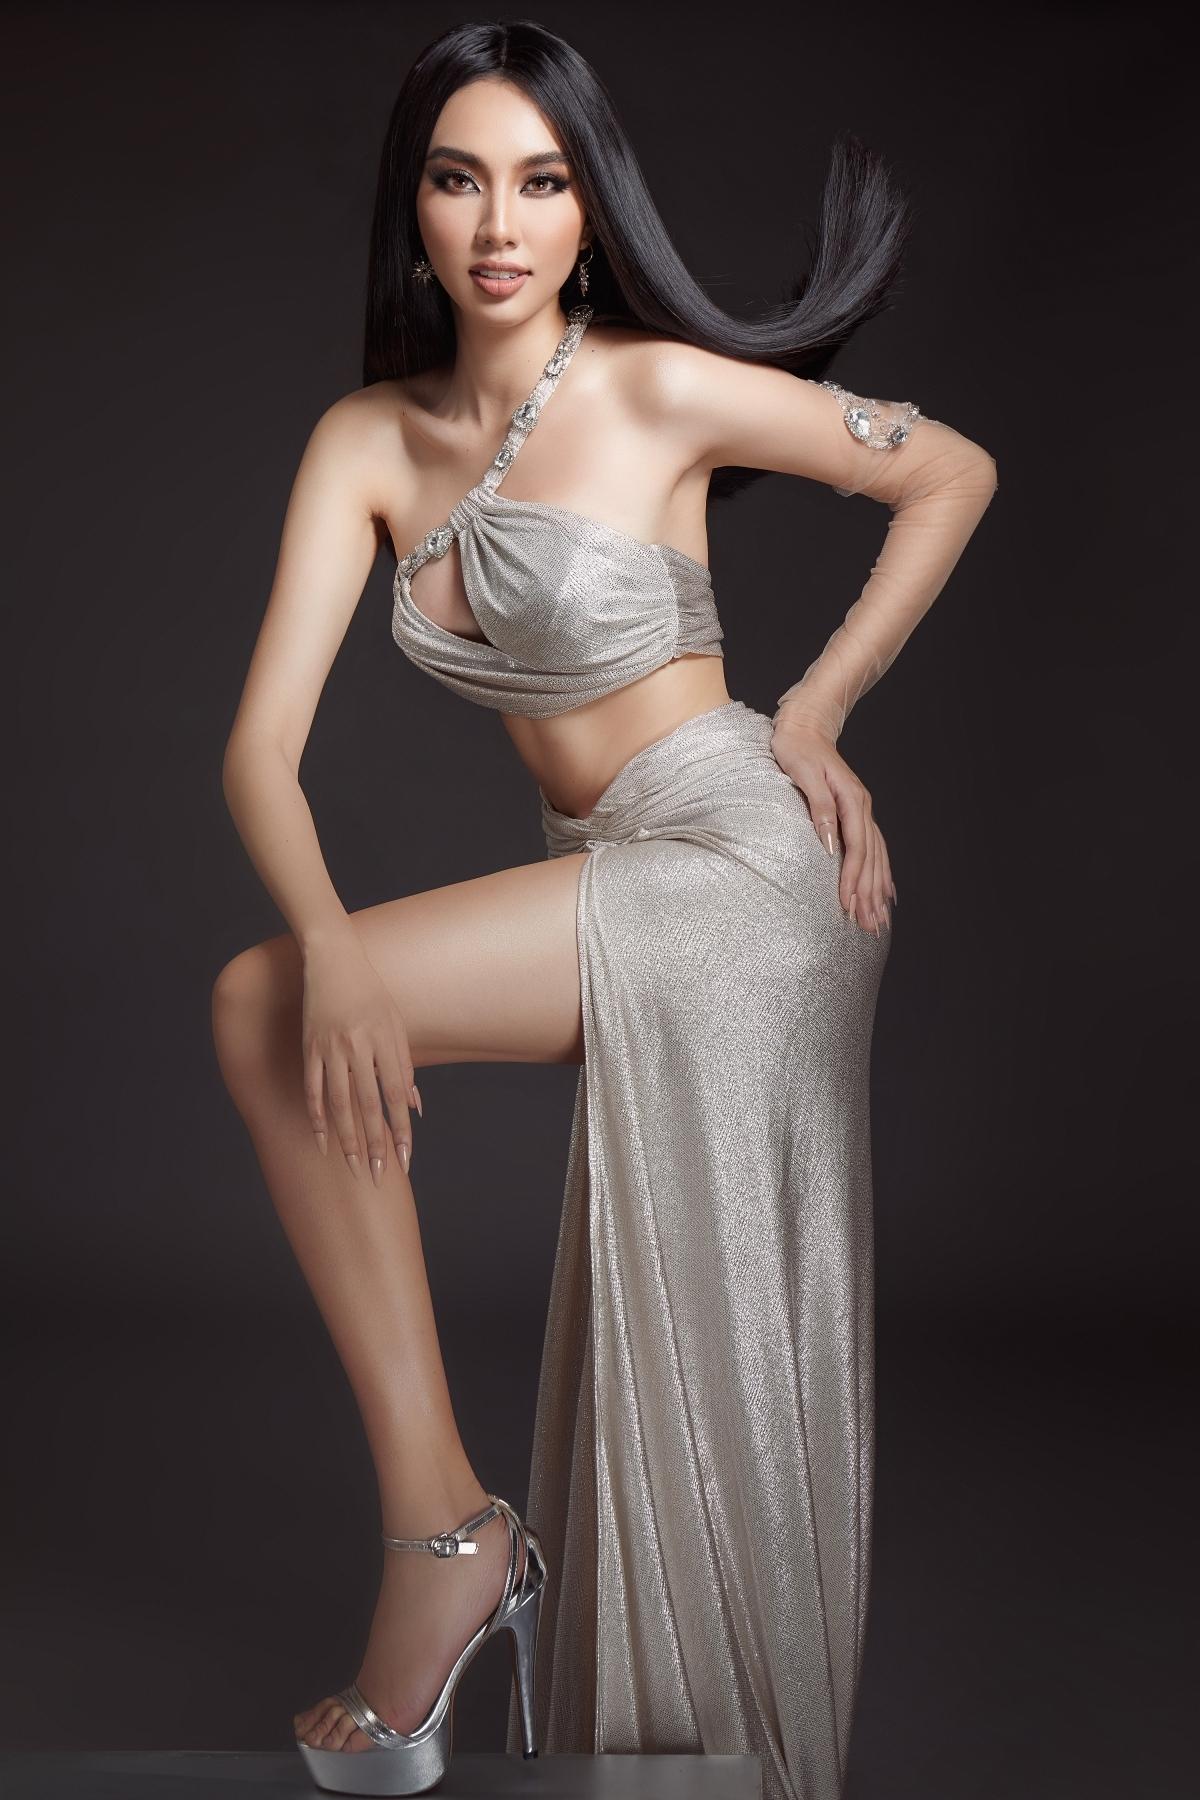 Thuy Tien represents Vietnam at Miss Grand International 2021